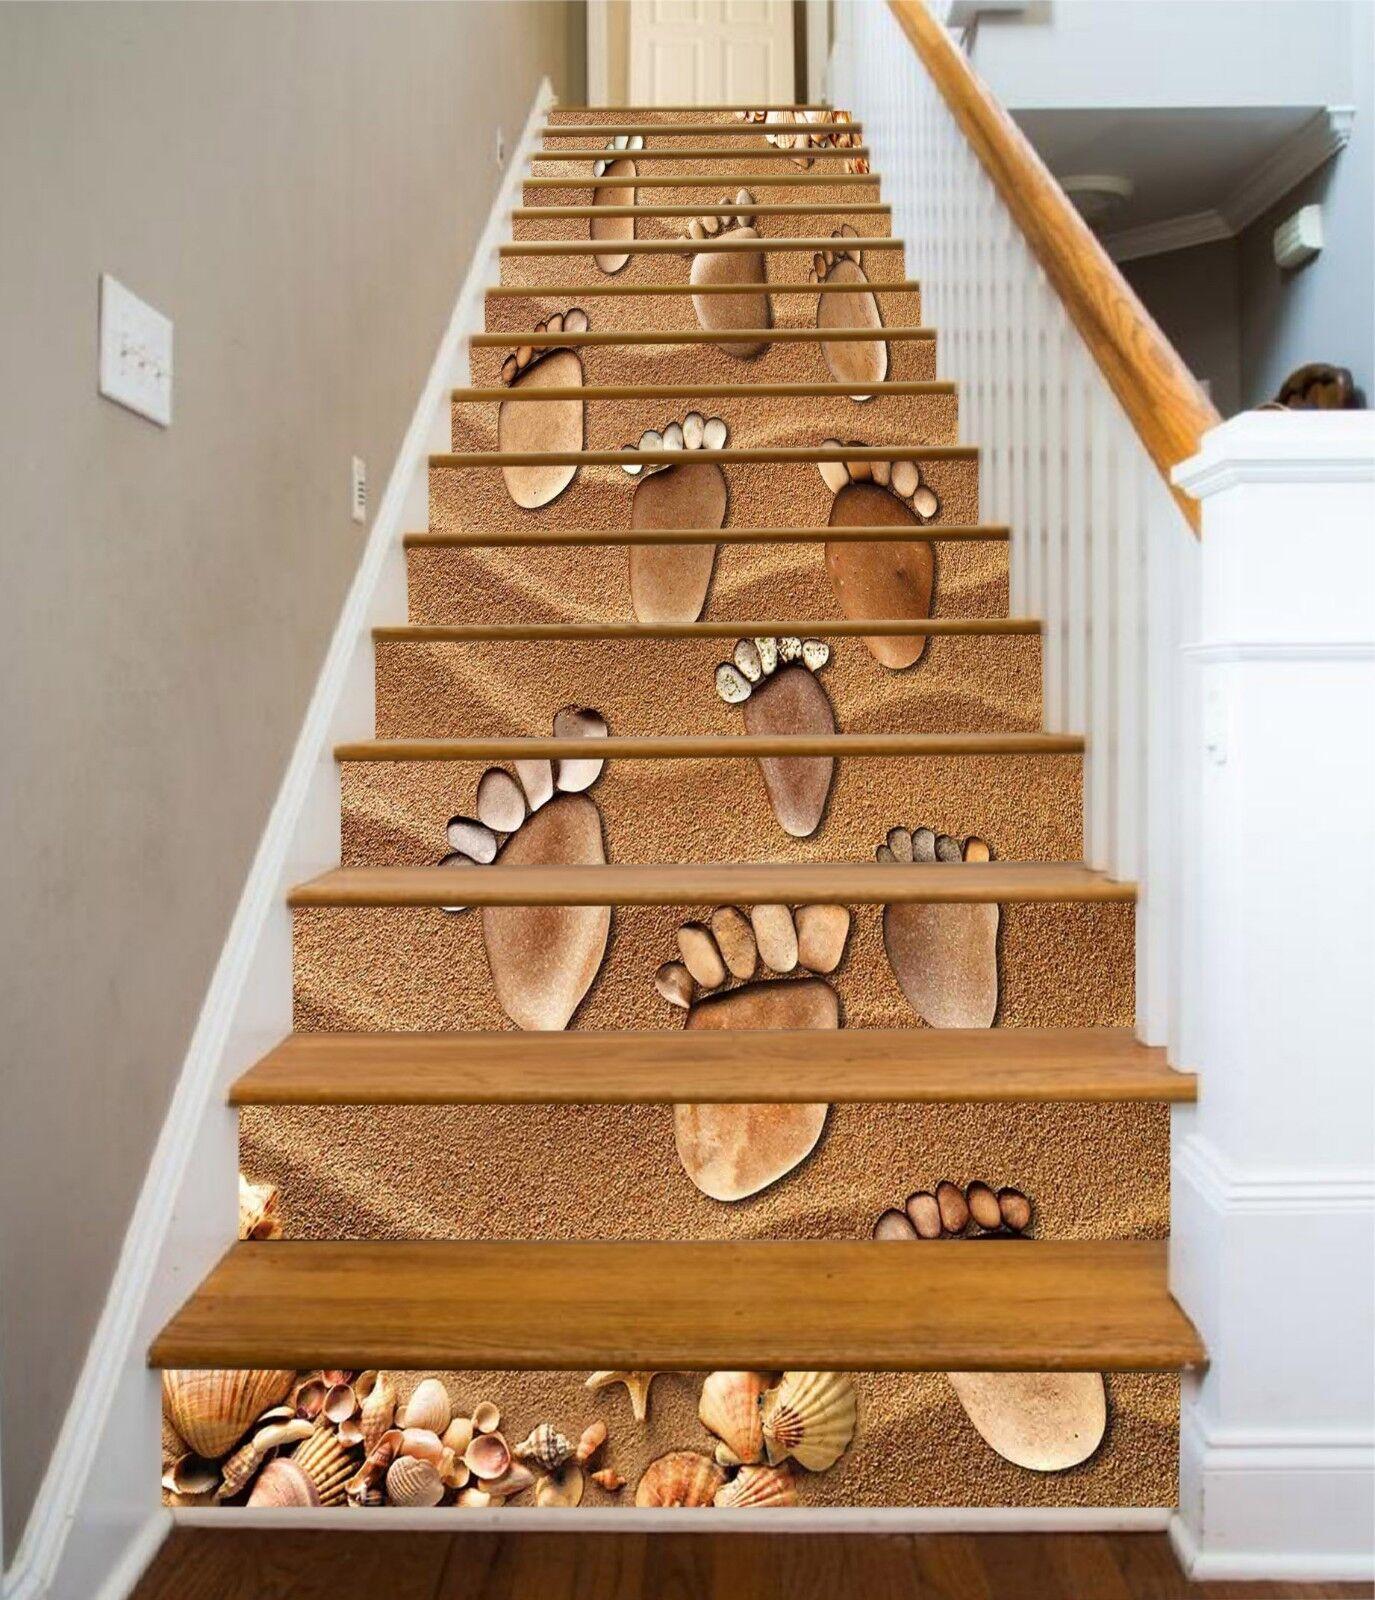 3D Footprint Stair Risers Decoration Photo Mural Vinyl Decal Wallpaper UK